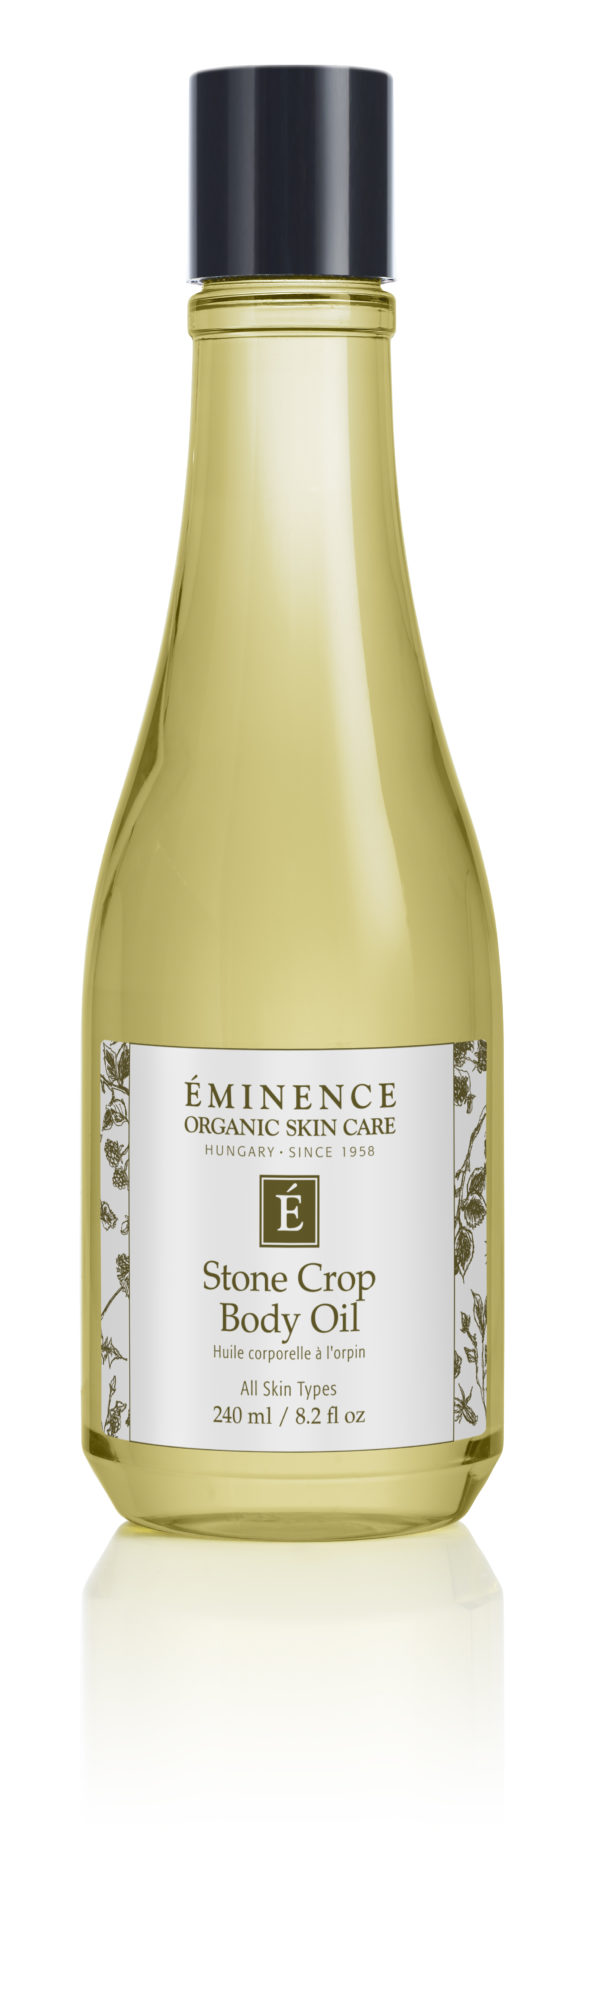 Eminence Stone Crop Body Oil